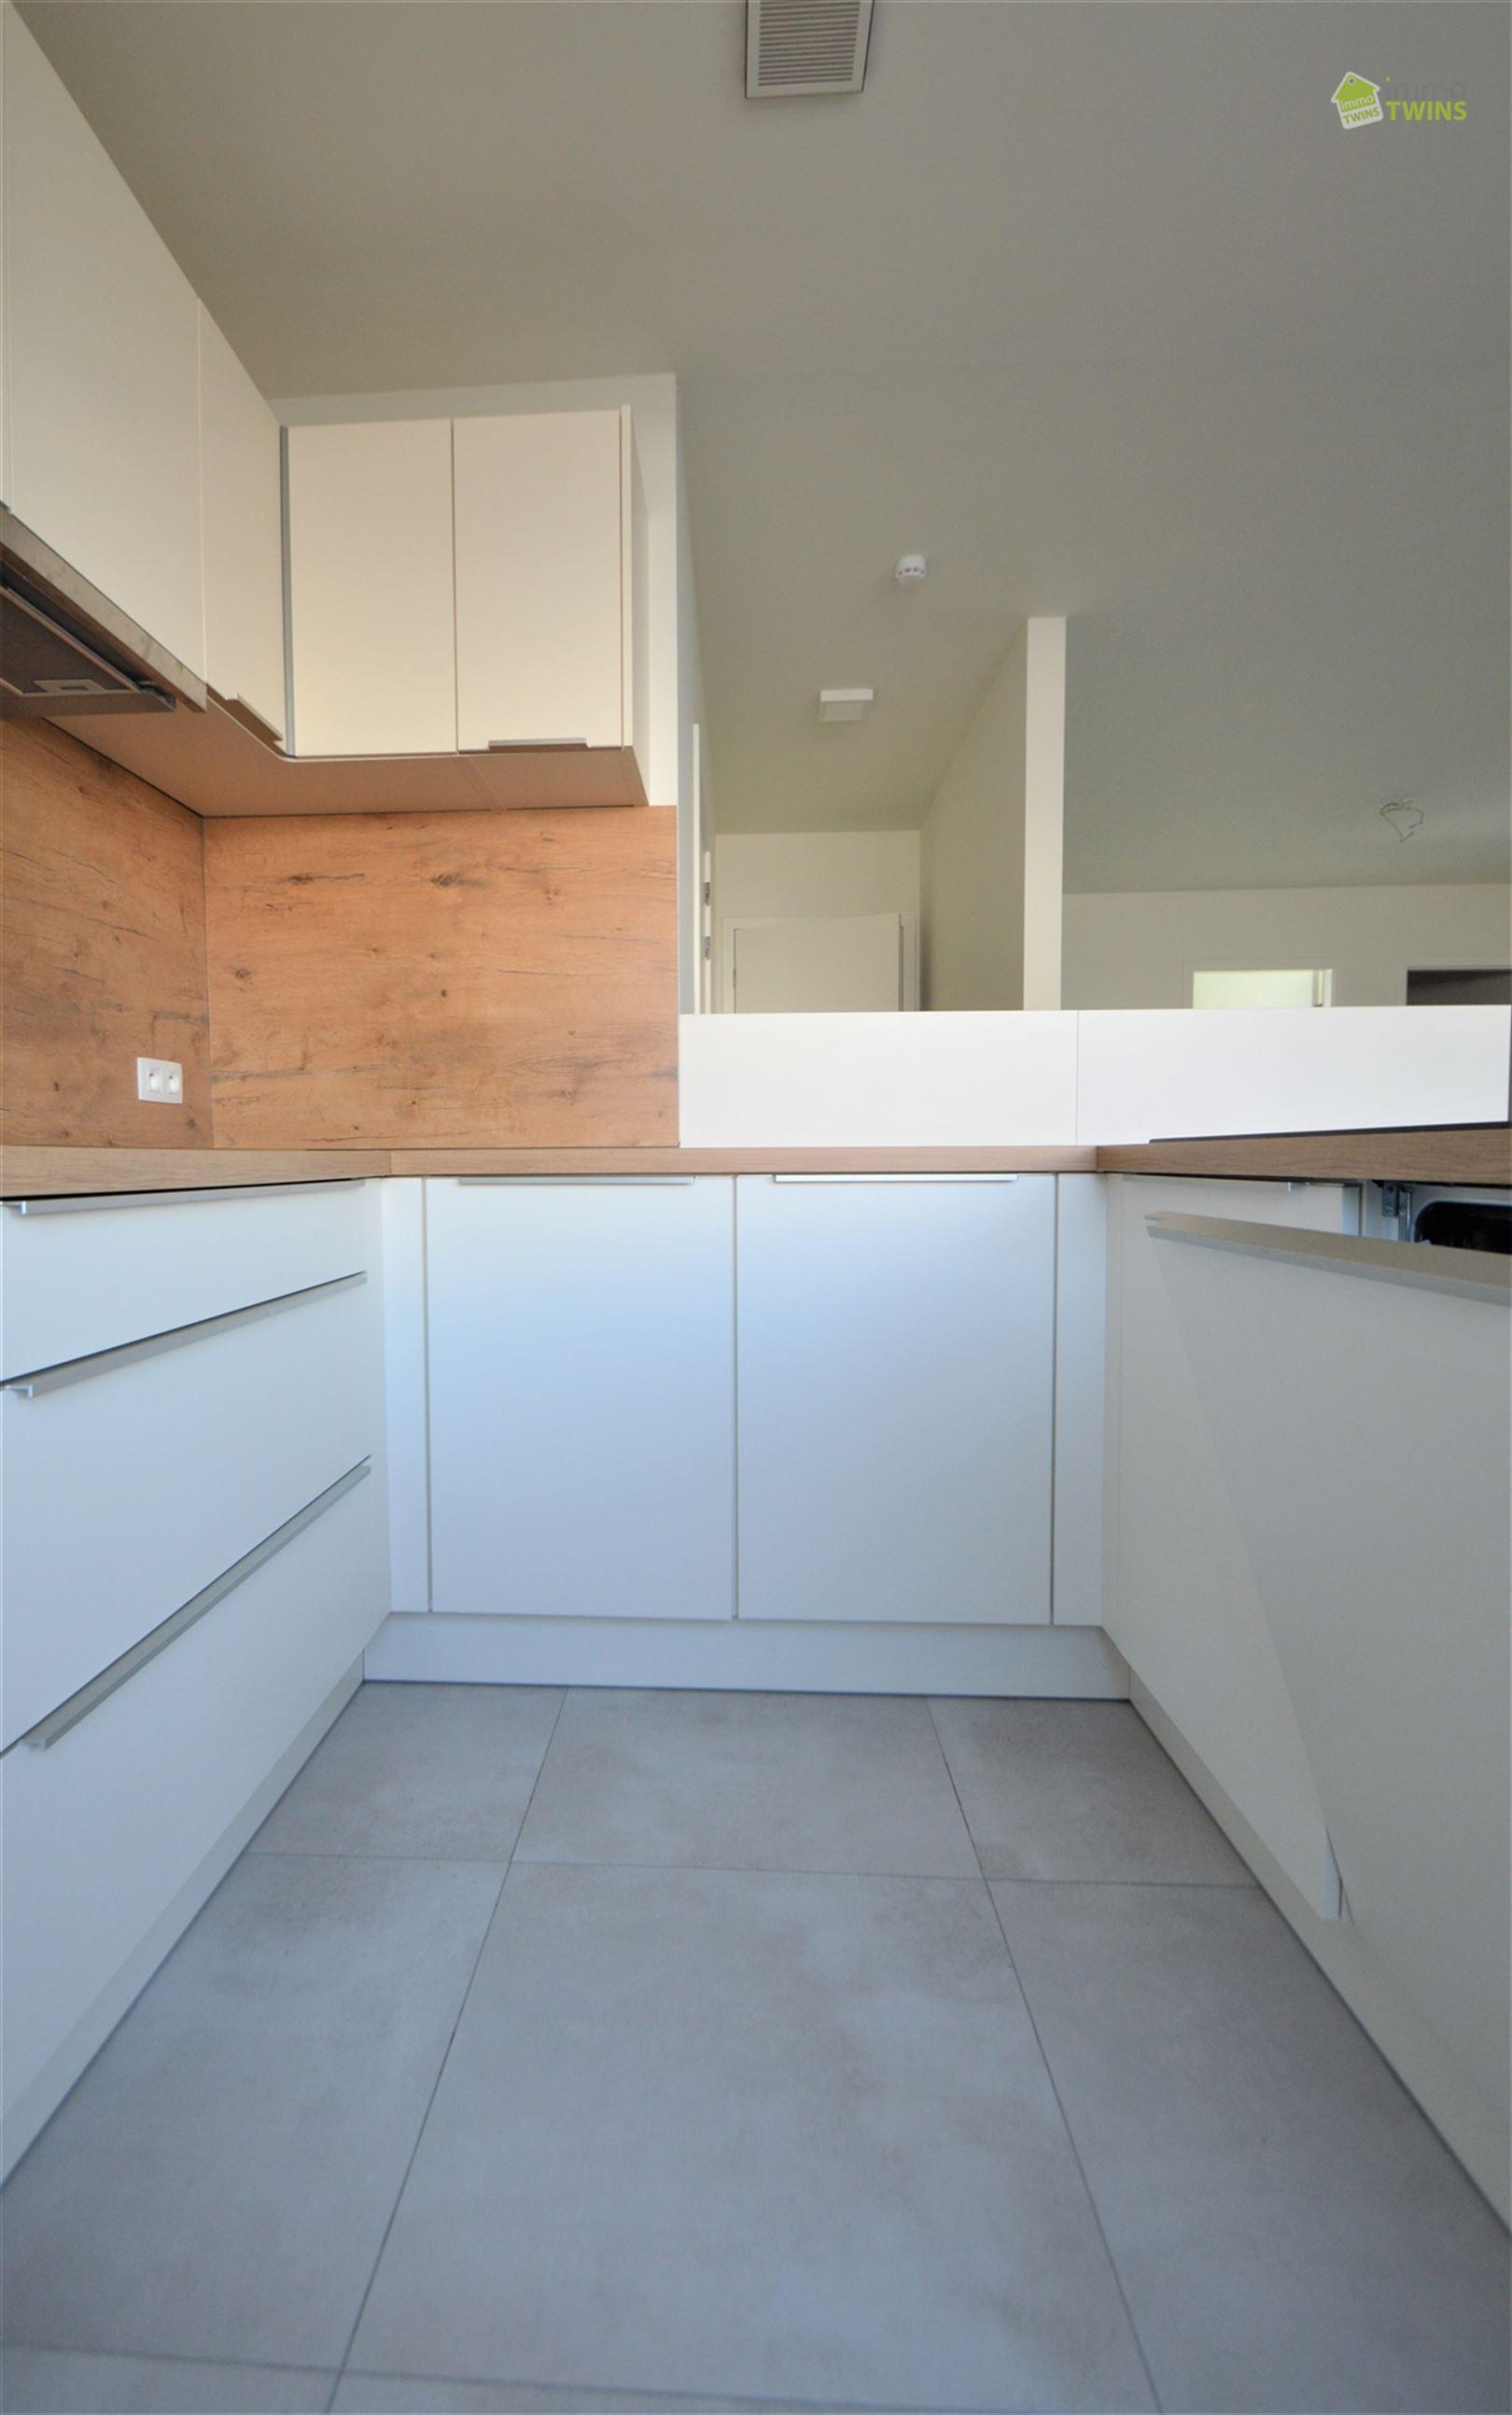 Foto 3 : Appartement te 9200 BAASRODE (België) - Prijs € 660